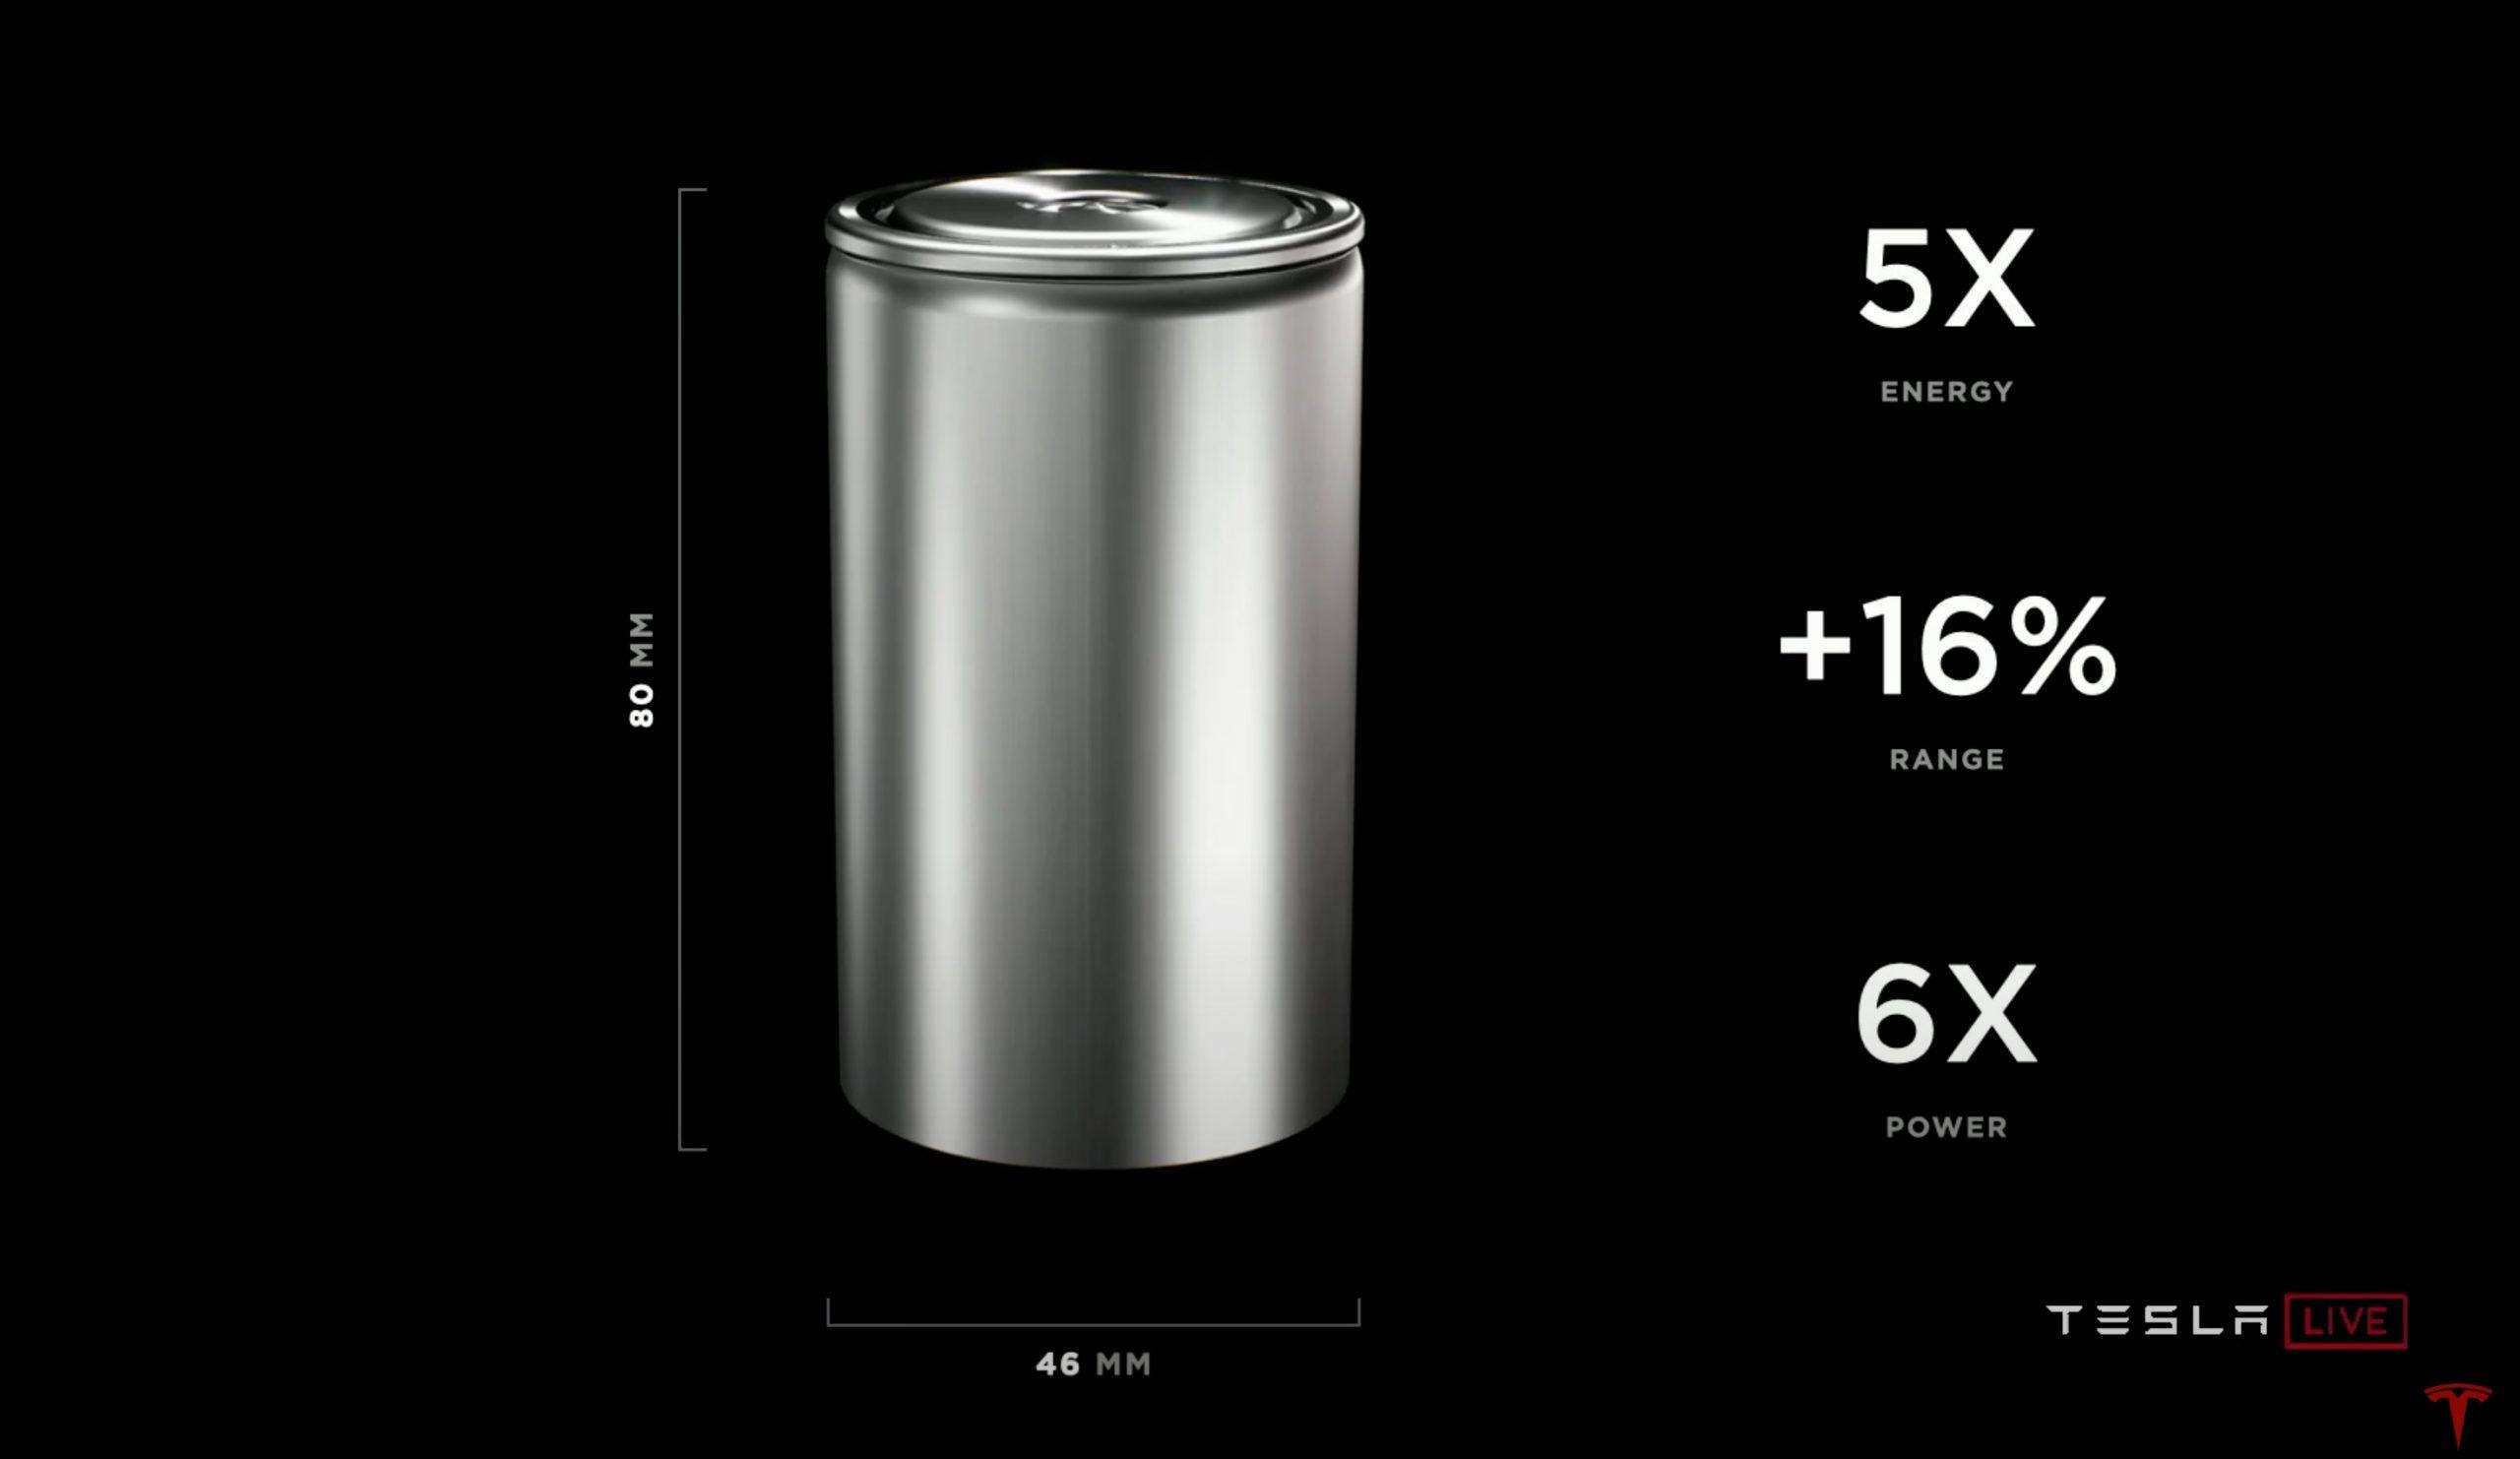 tesla-4680-battery-cell-specs